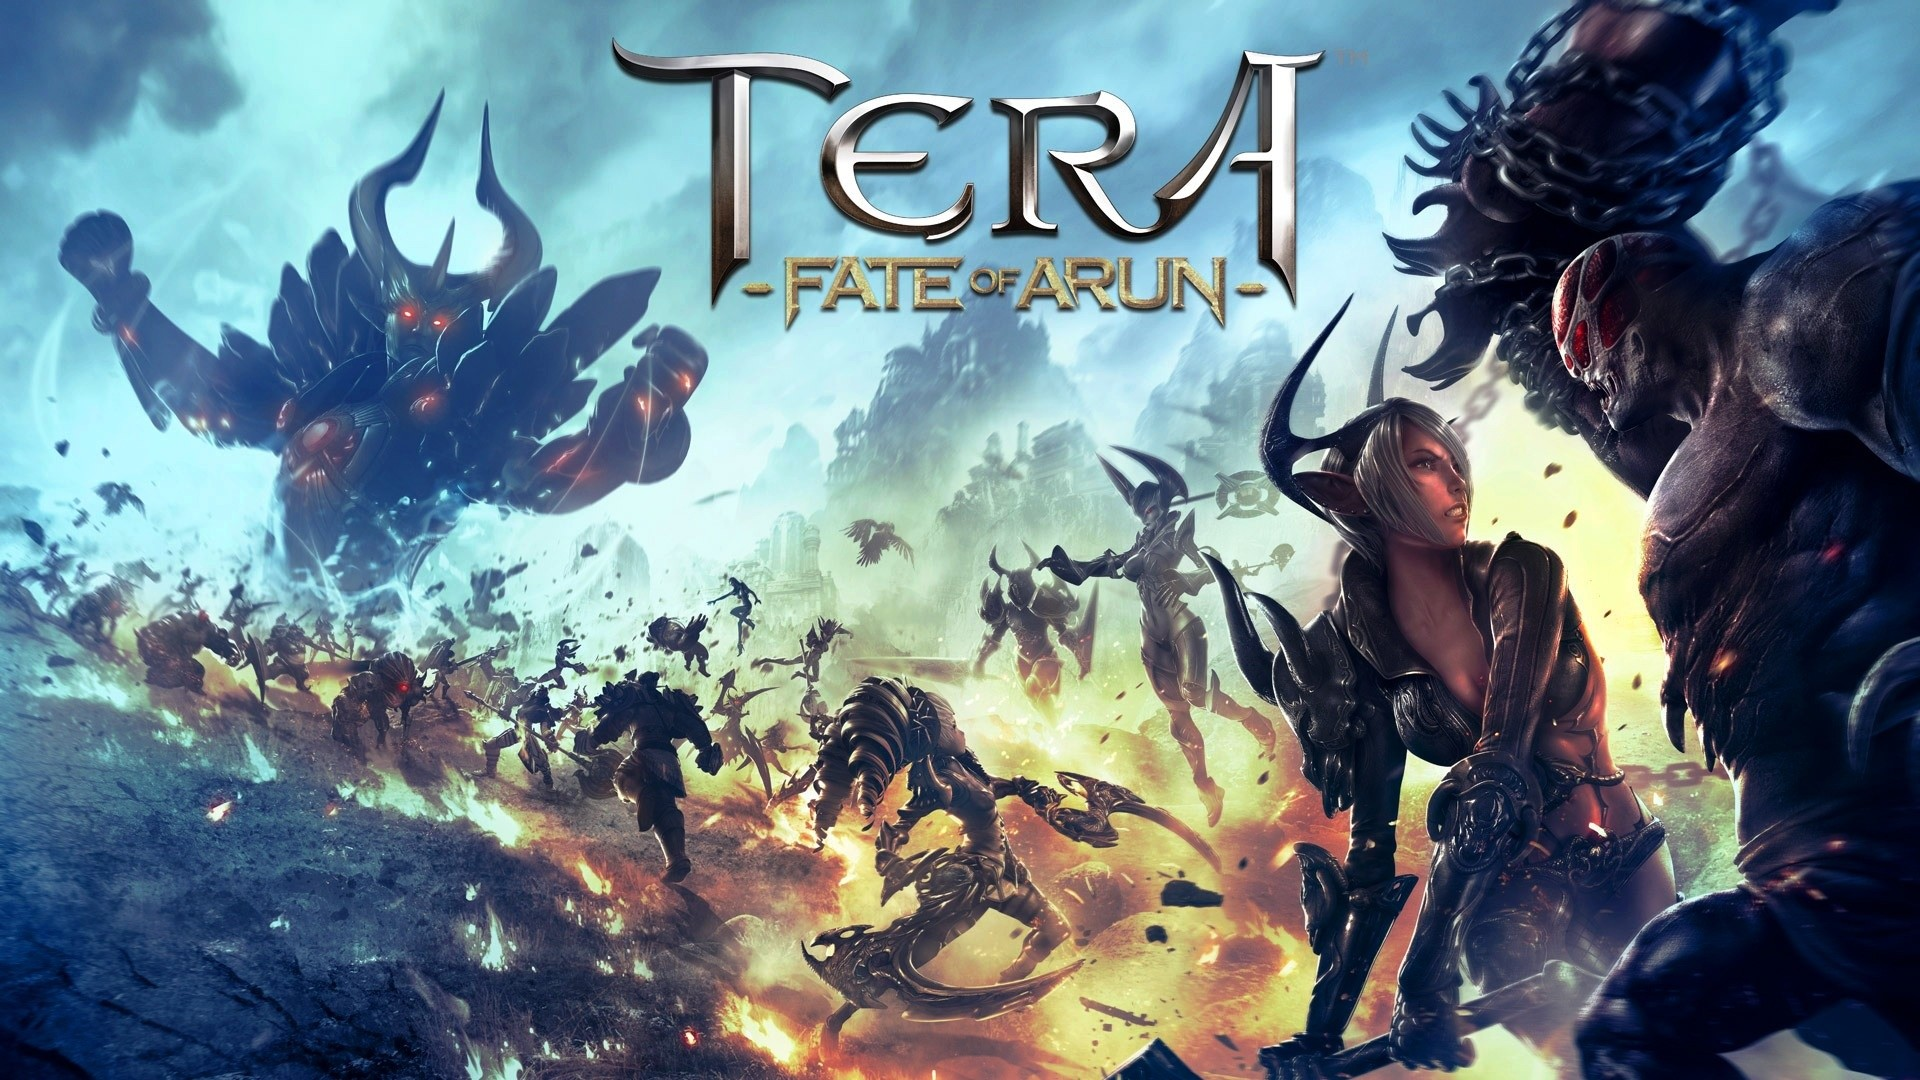 Tera: Fate Of Arun 2014